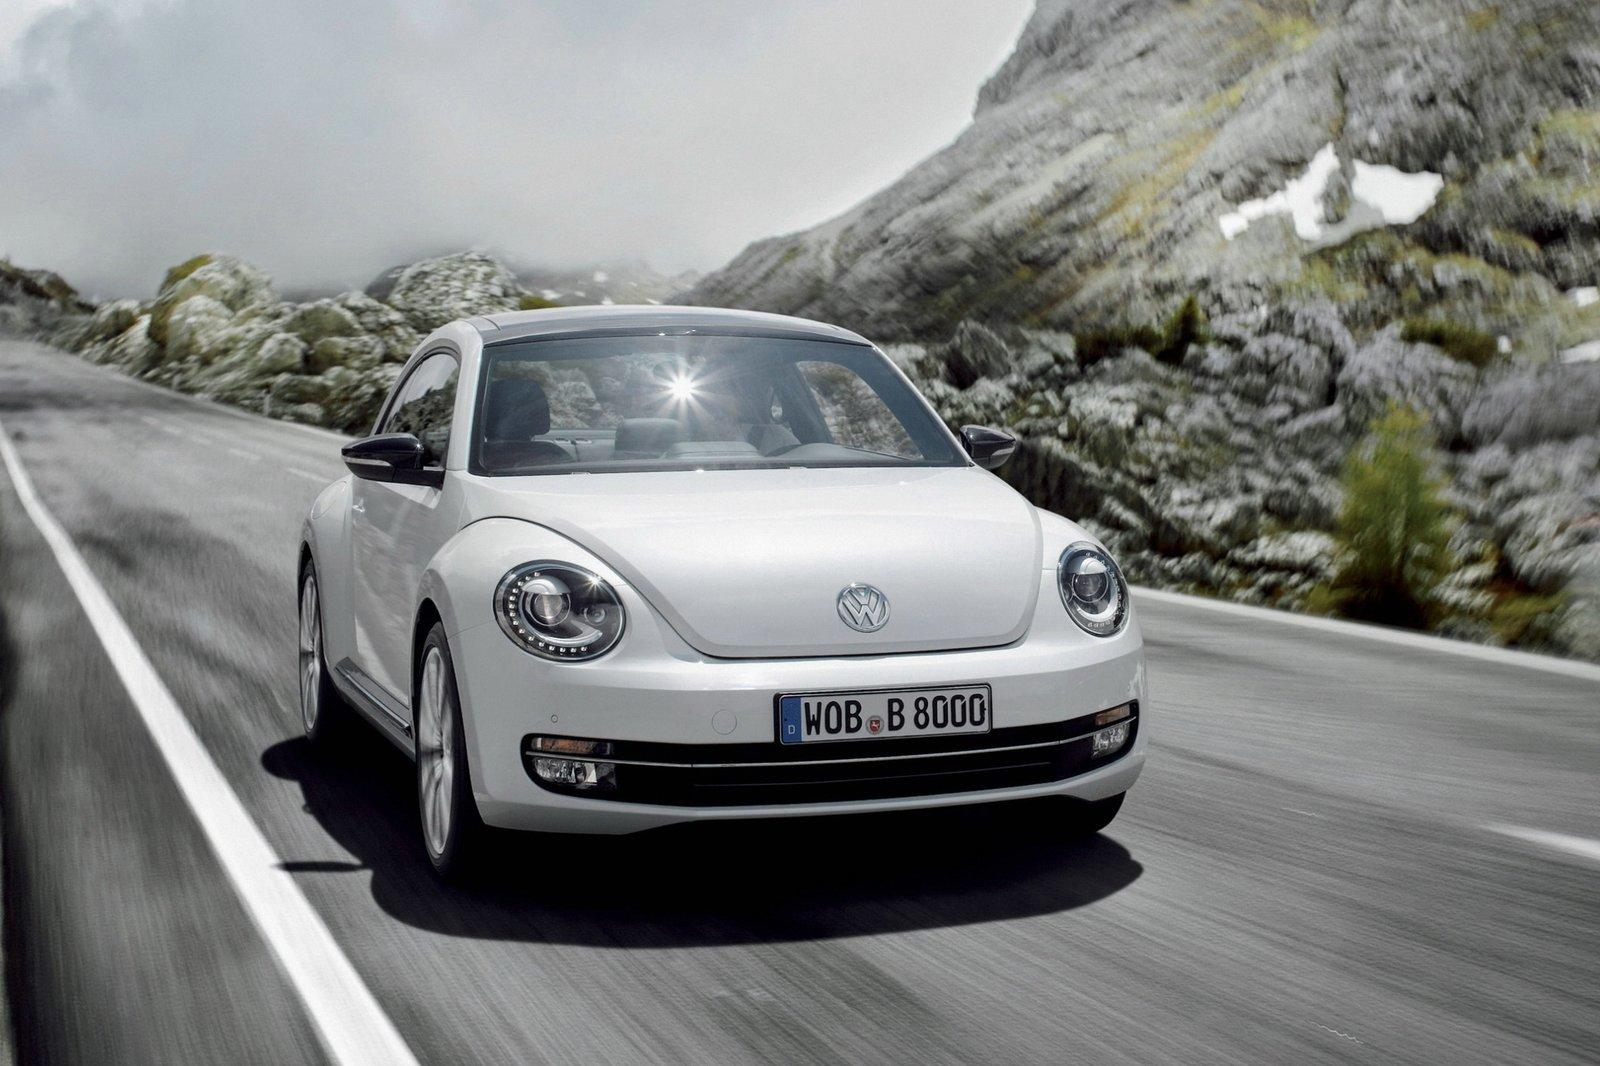 VW MAGGIOLINO MAGGIOLONE BEETLE KARMANN LOGO COFANO POSTERIORE ENGINE LID EMBLEM